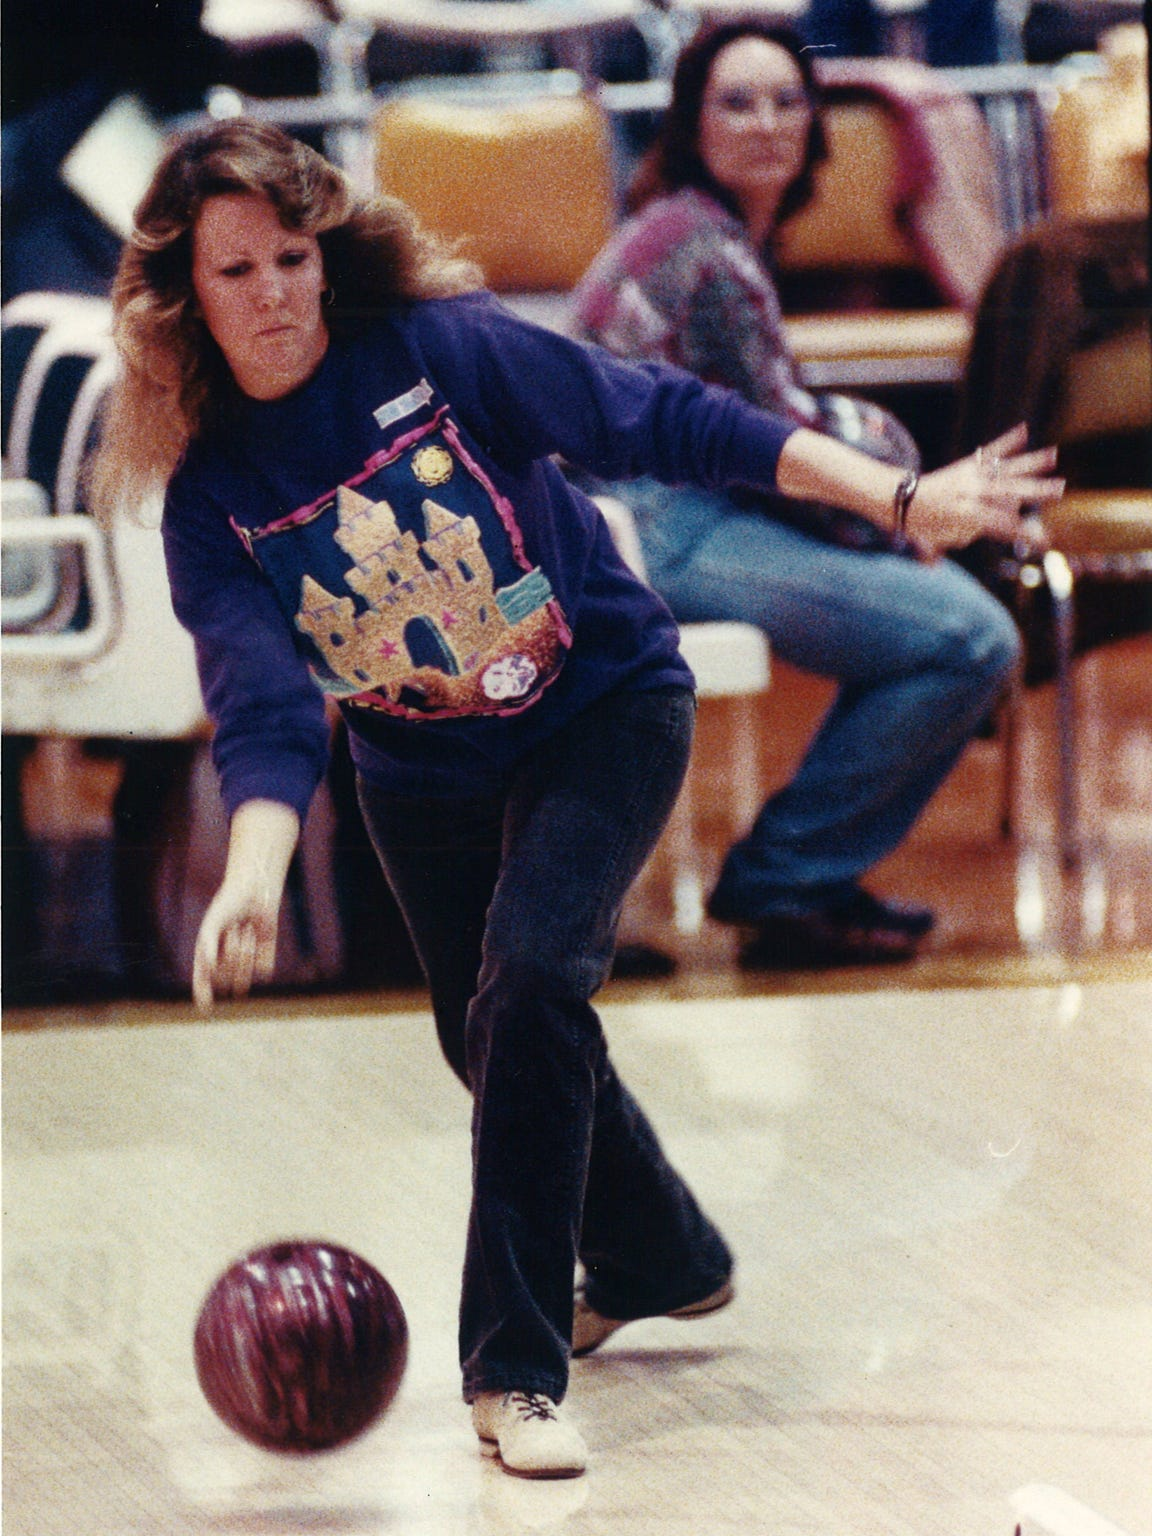 Laura Tate of the Corpus Christi Women's Bowling Association,